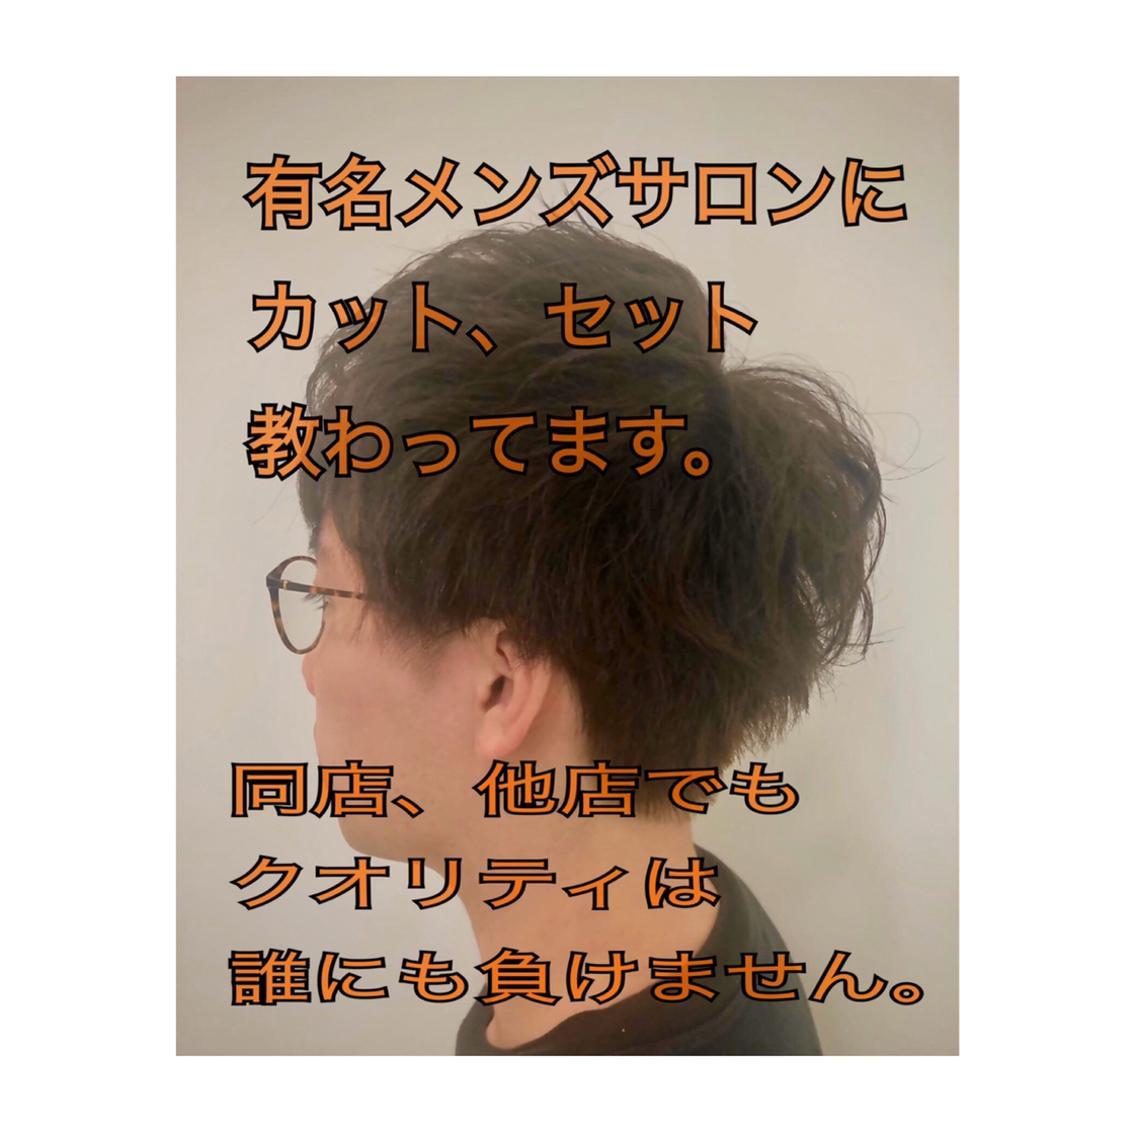 IDEA NOV BAssA所属・太田 千歳おおた ちとせの掲載